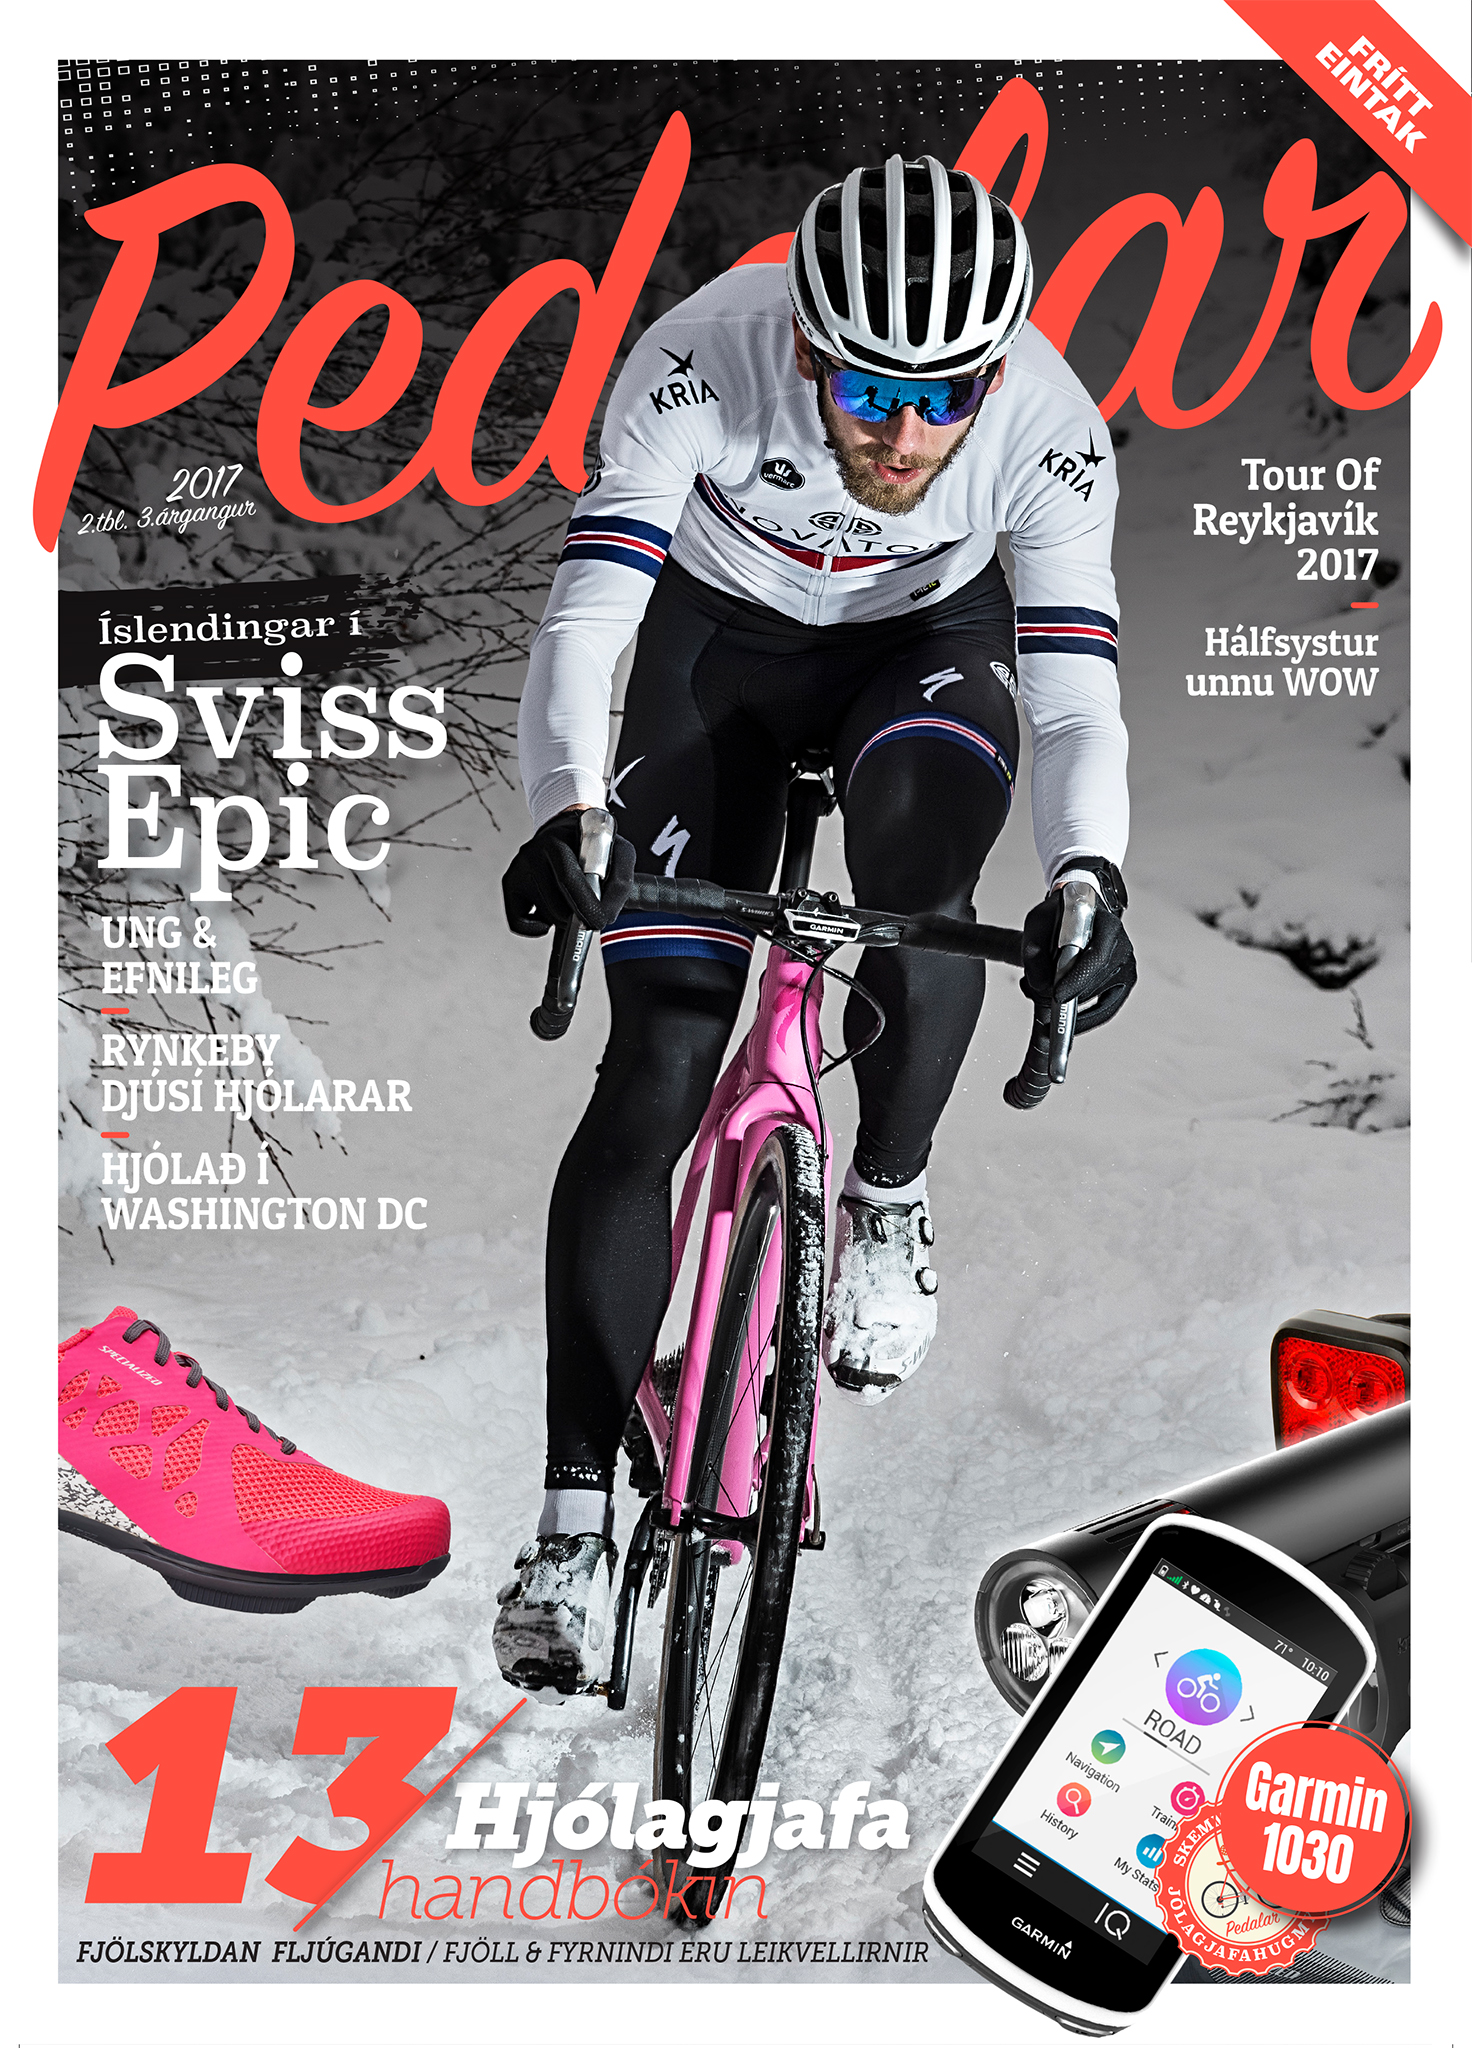 pedalar-02017-cover